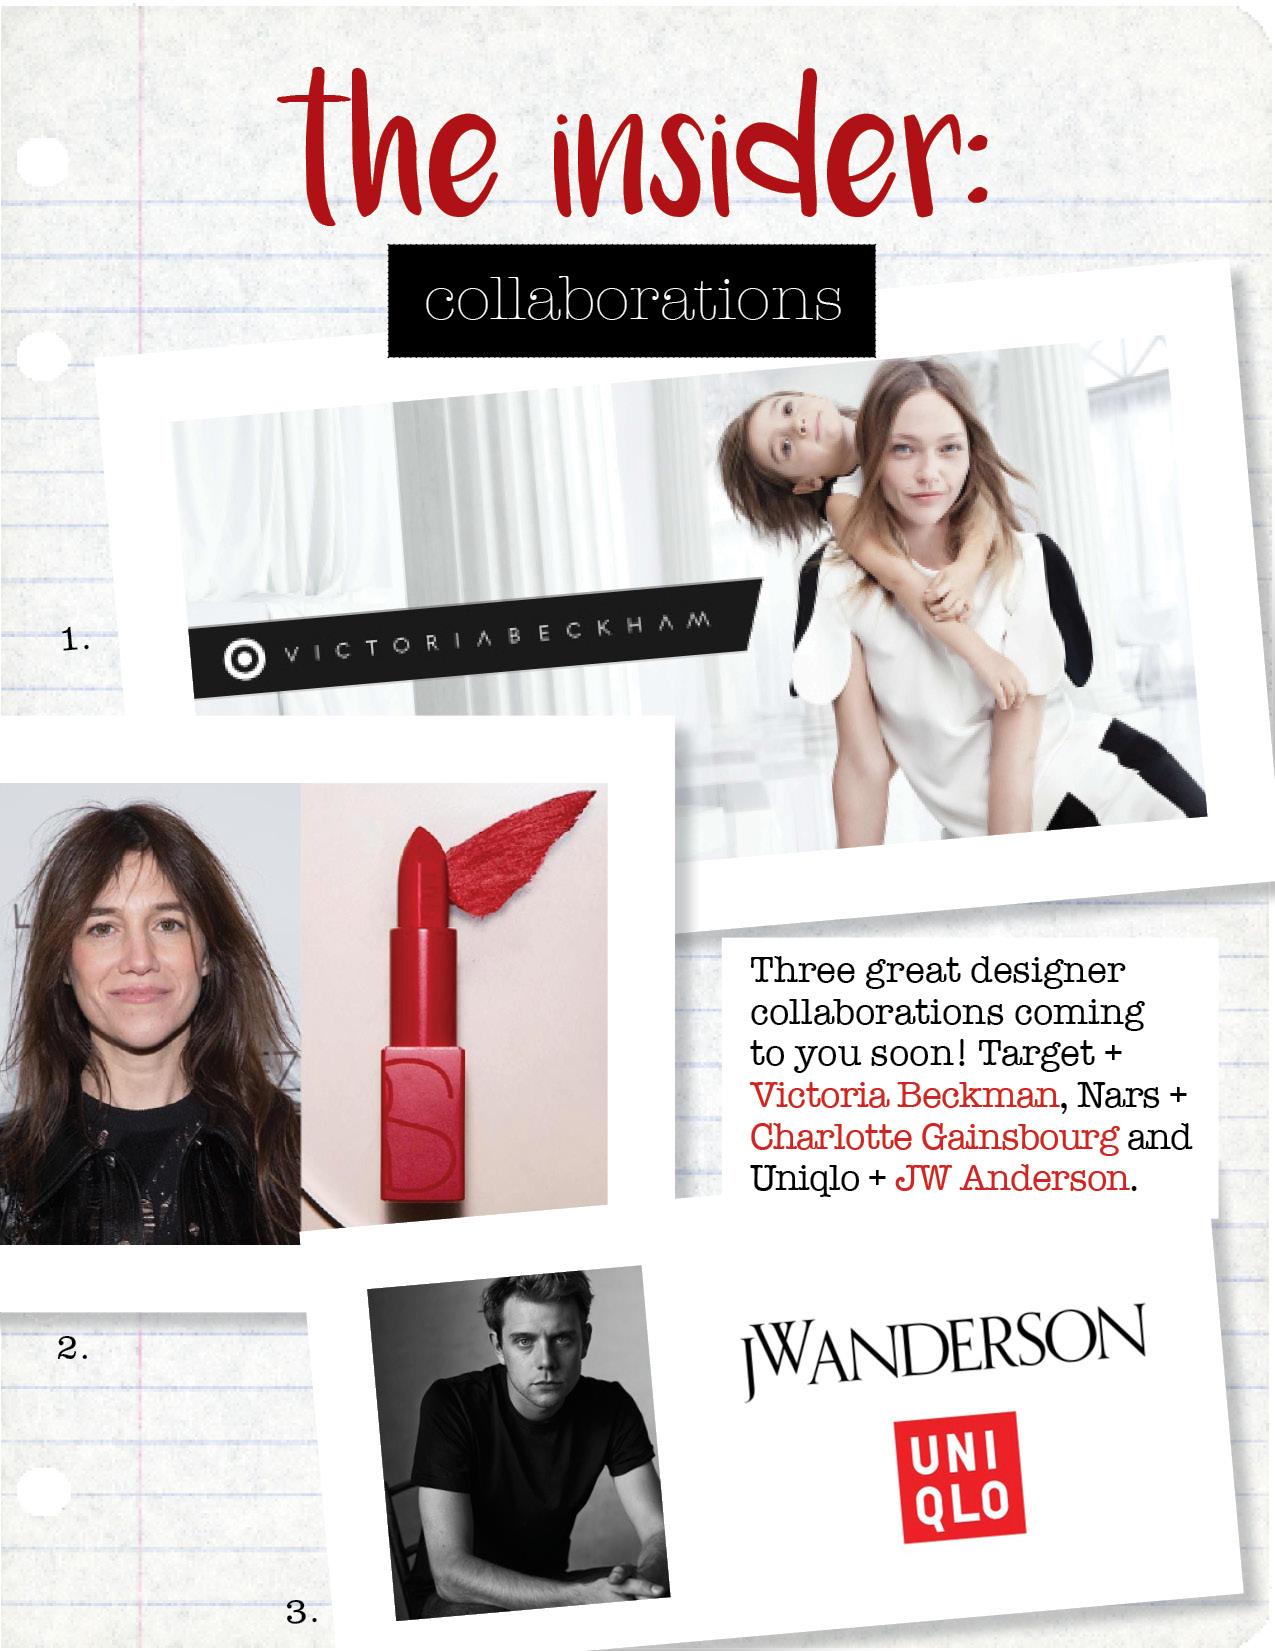 1. victoria beckham for target,  target.com  2. charlotte gainsbourg for nars,  narscosmetics.com  3. jw anderson for uniqlo,  businessoffashion.com